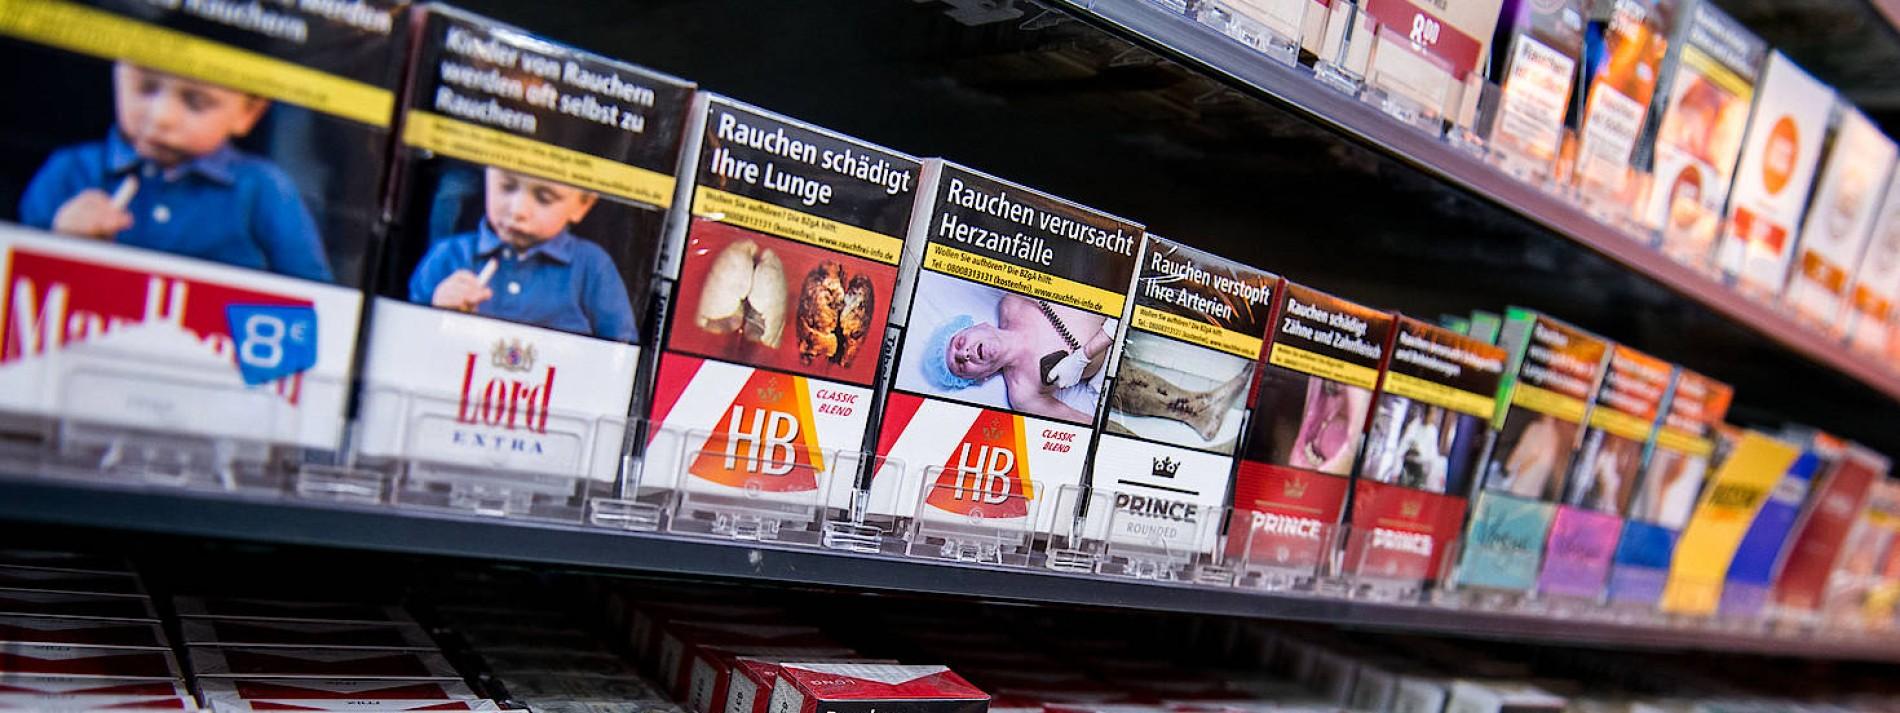 Verlogene Tabaksteuer